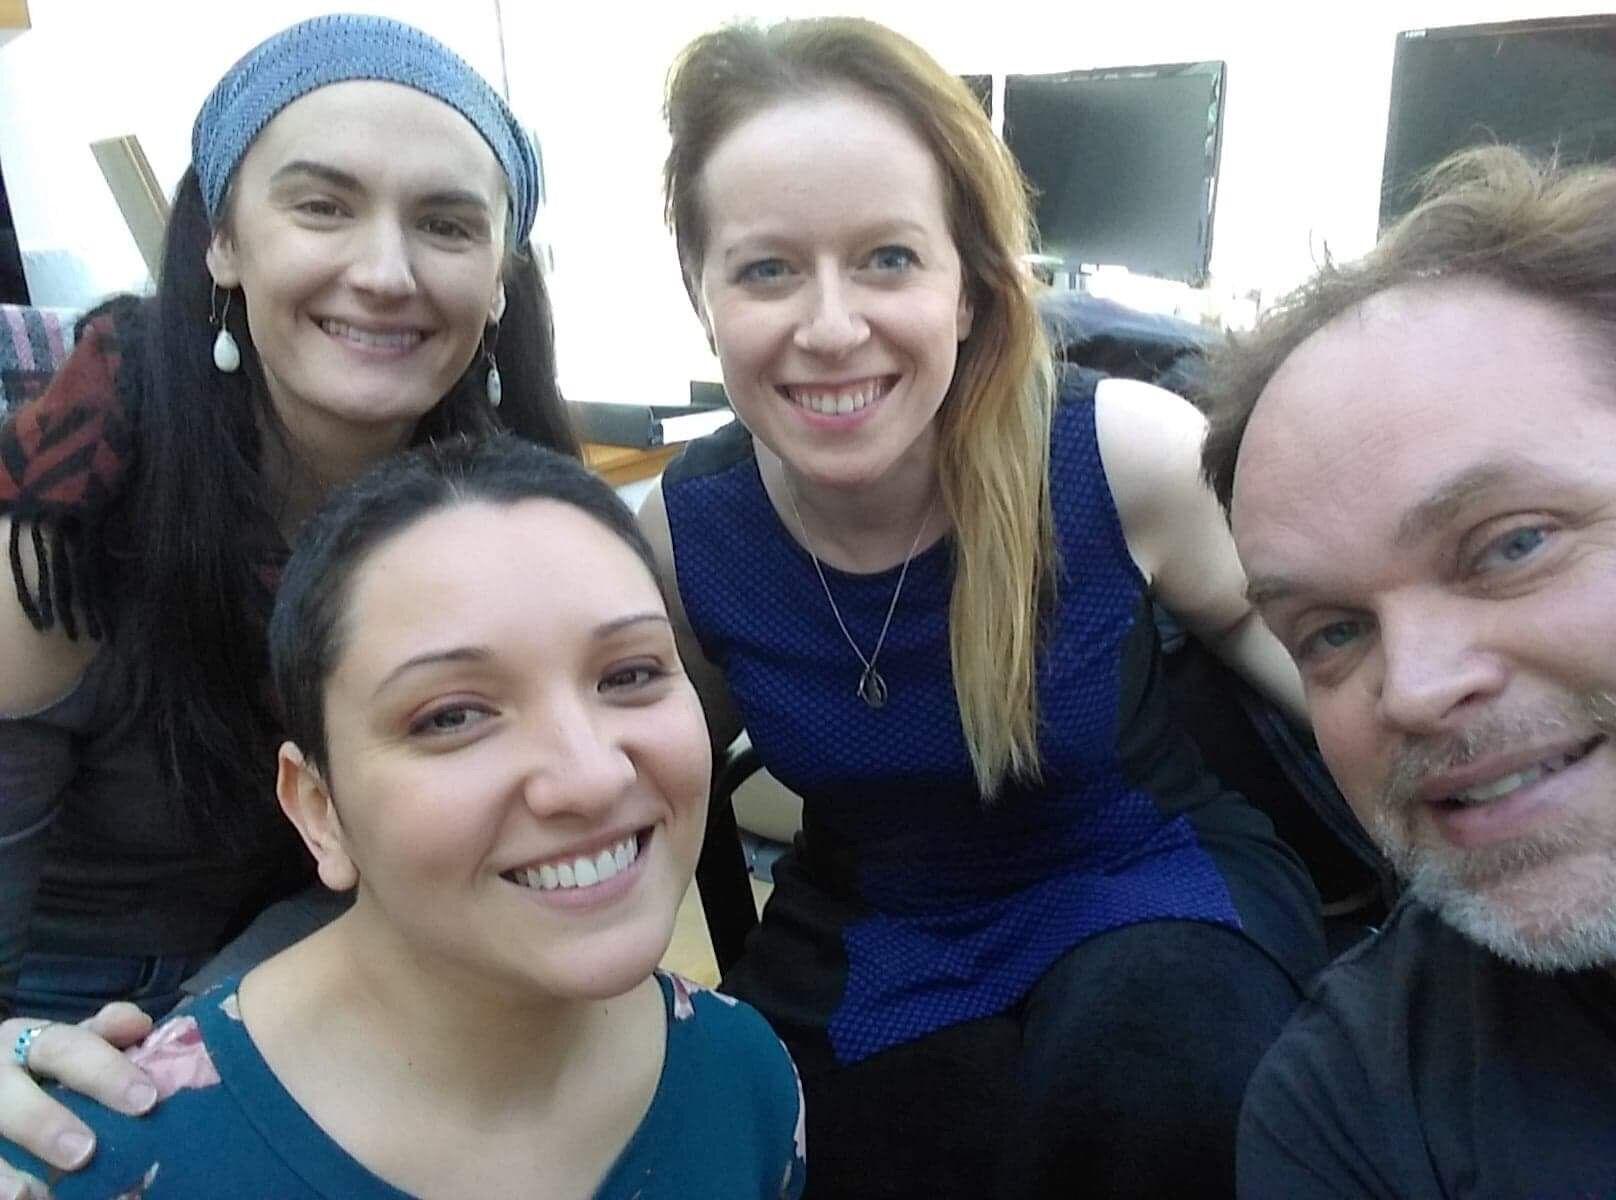 The cast of Rumpelstiltskin in the studio! Aliana de la Guardia (Rumpelstiltskin), Britt Brown (Gretchen), Emily Thorner (Miller), Brian Church (King).